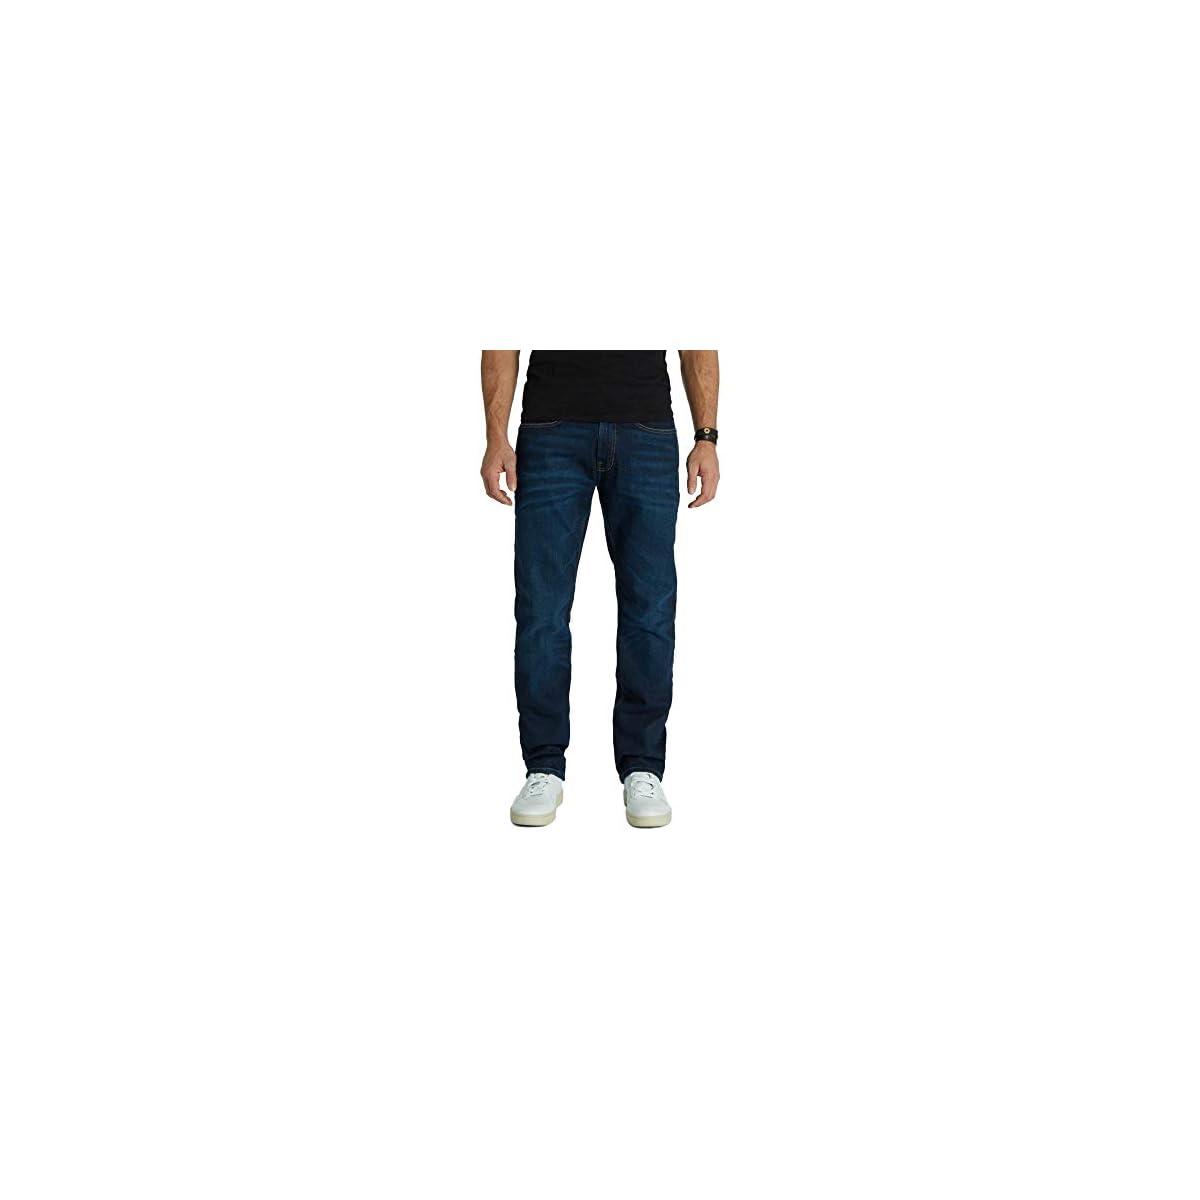 Kuyichi Herren Jeans Scott Regular Bio-Baumwolle Classic Blue